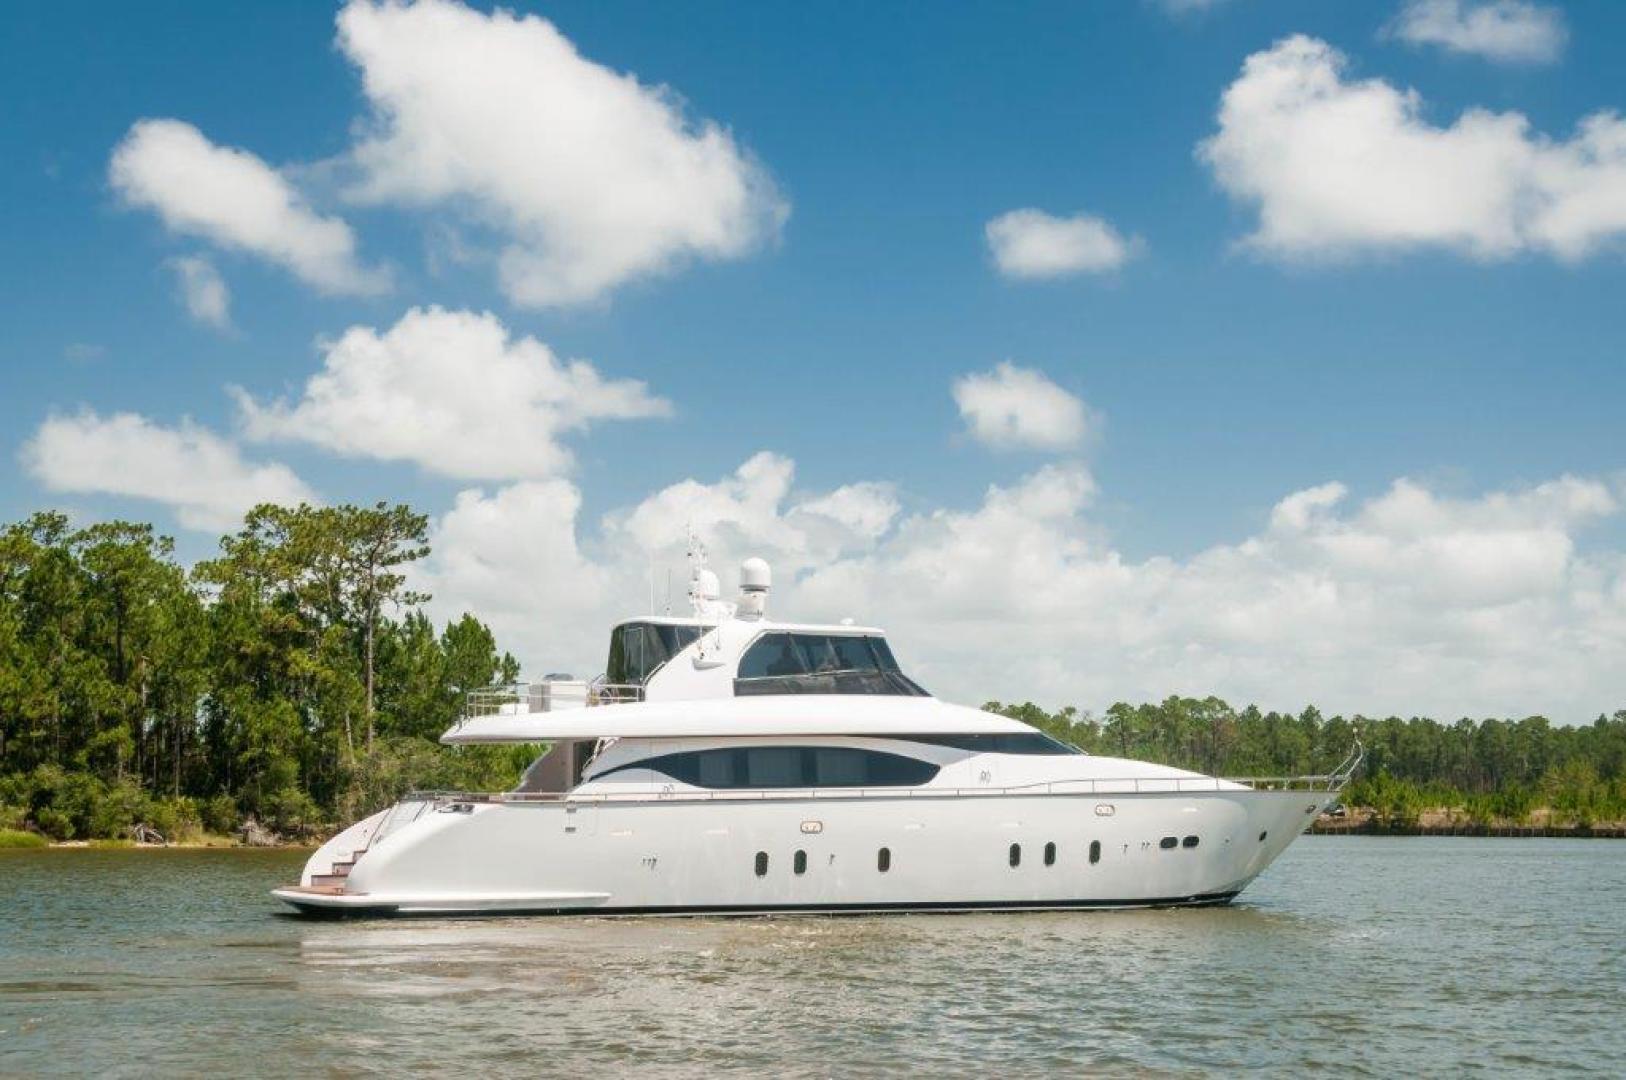 Maiora-84 Motor Yacht 2015-Never Rest SANDESTIN-Florida-United States-2015 Maiora 84 Motor Yacht Never Rest Starboard Profile-720529 | Thumbnail